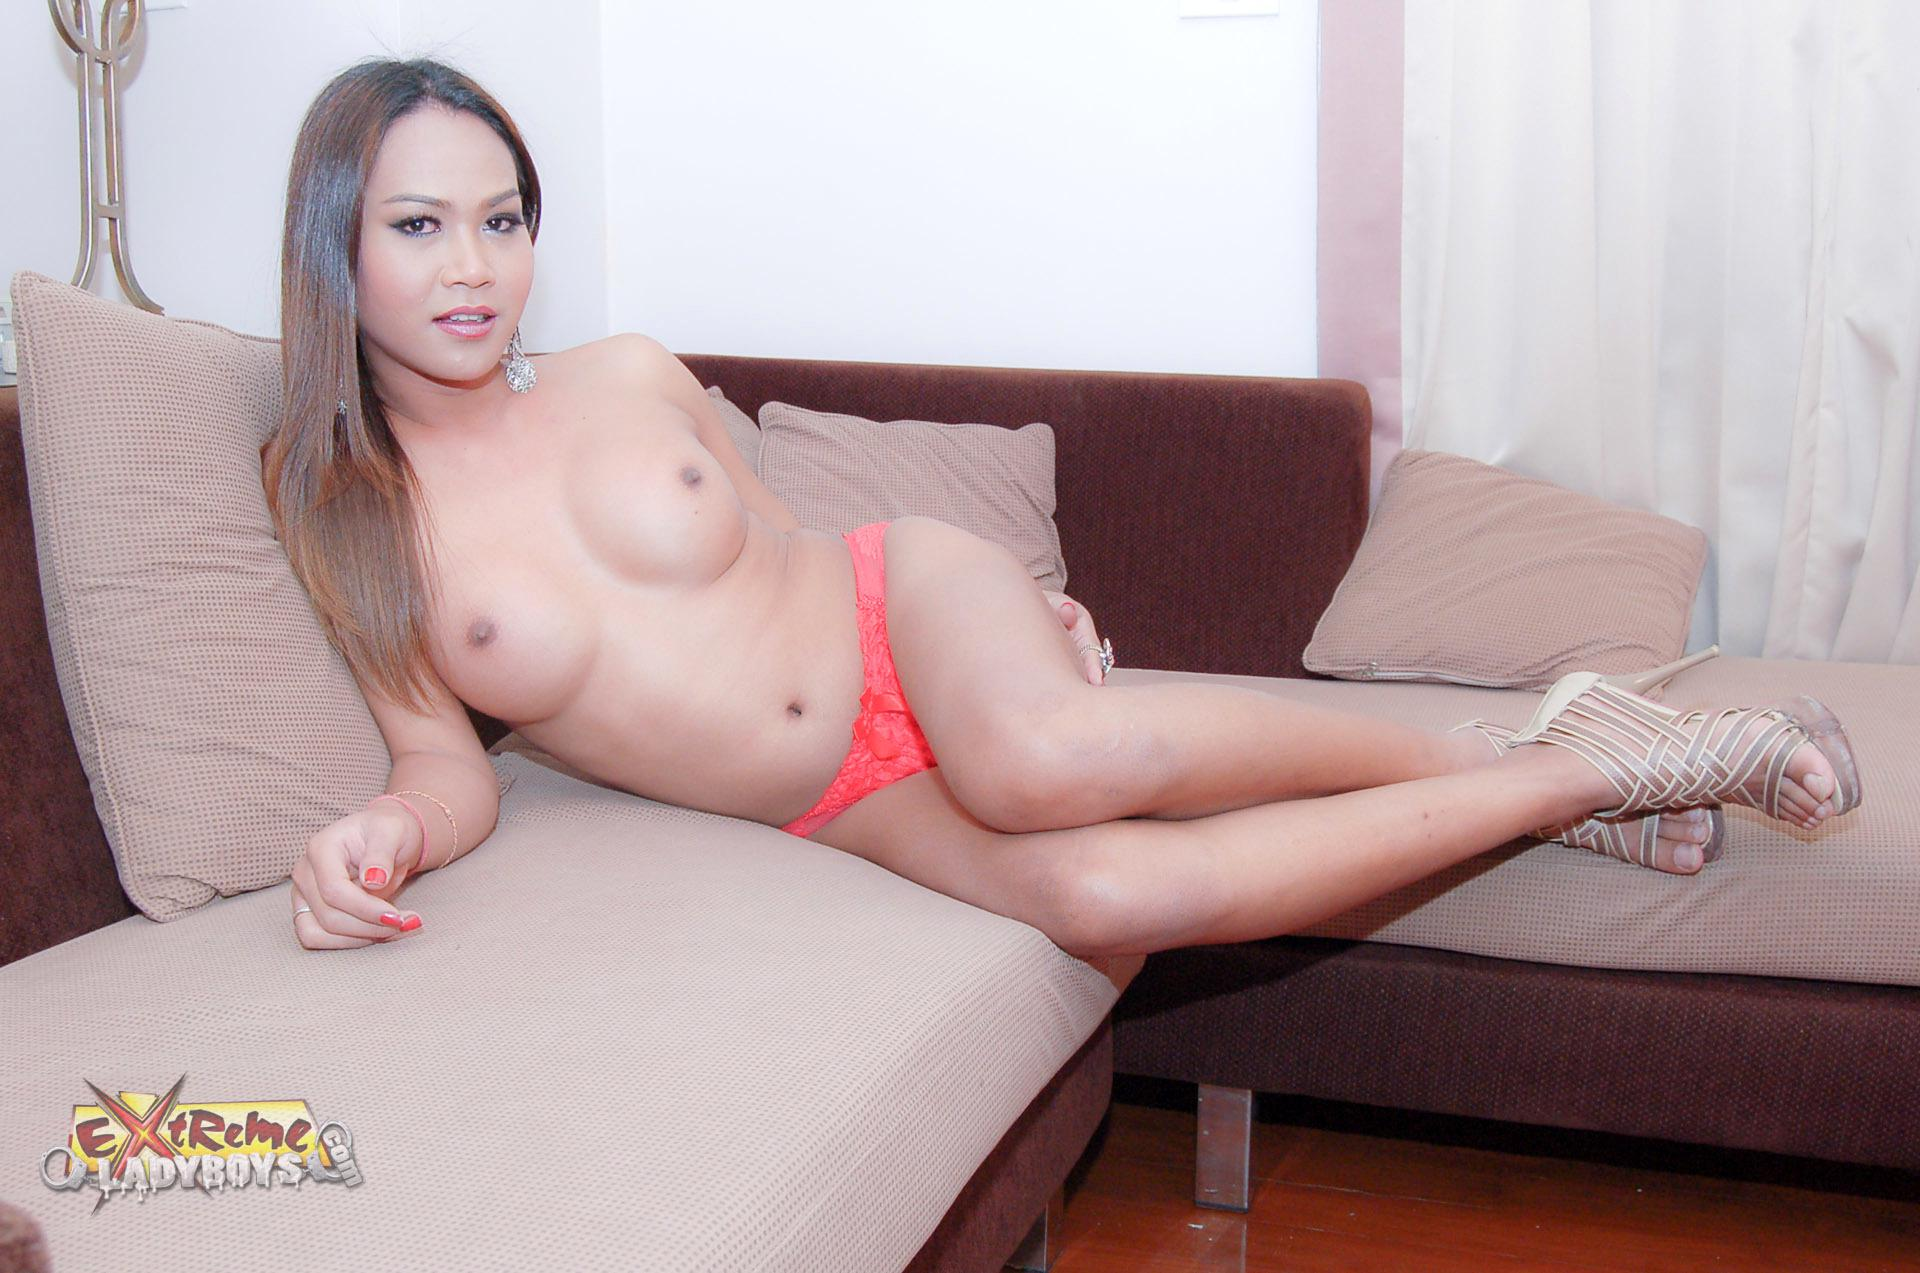 Petite Transexual Shows Her Slim Figure